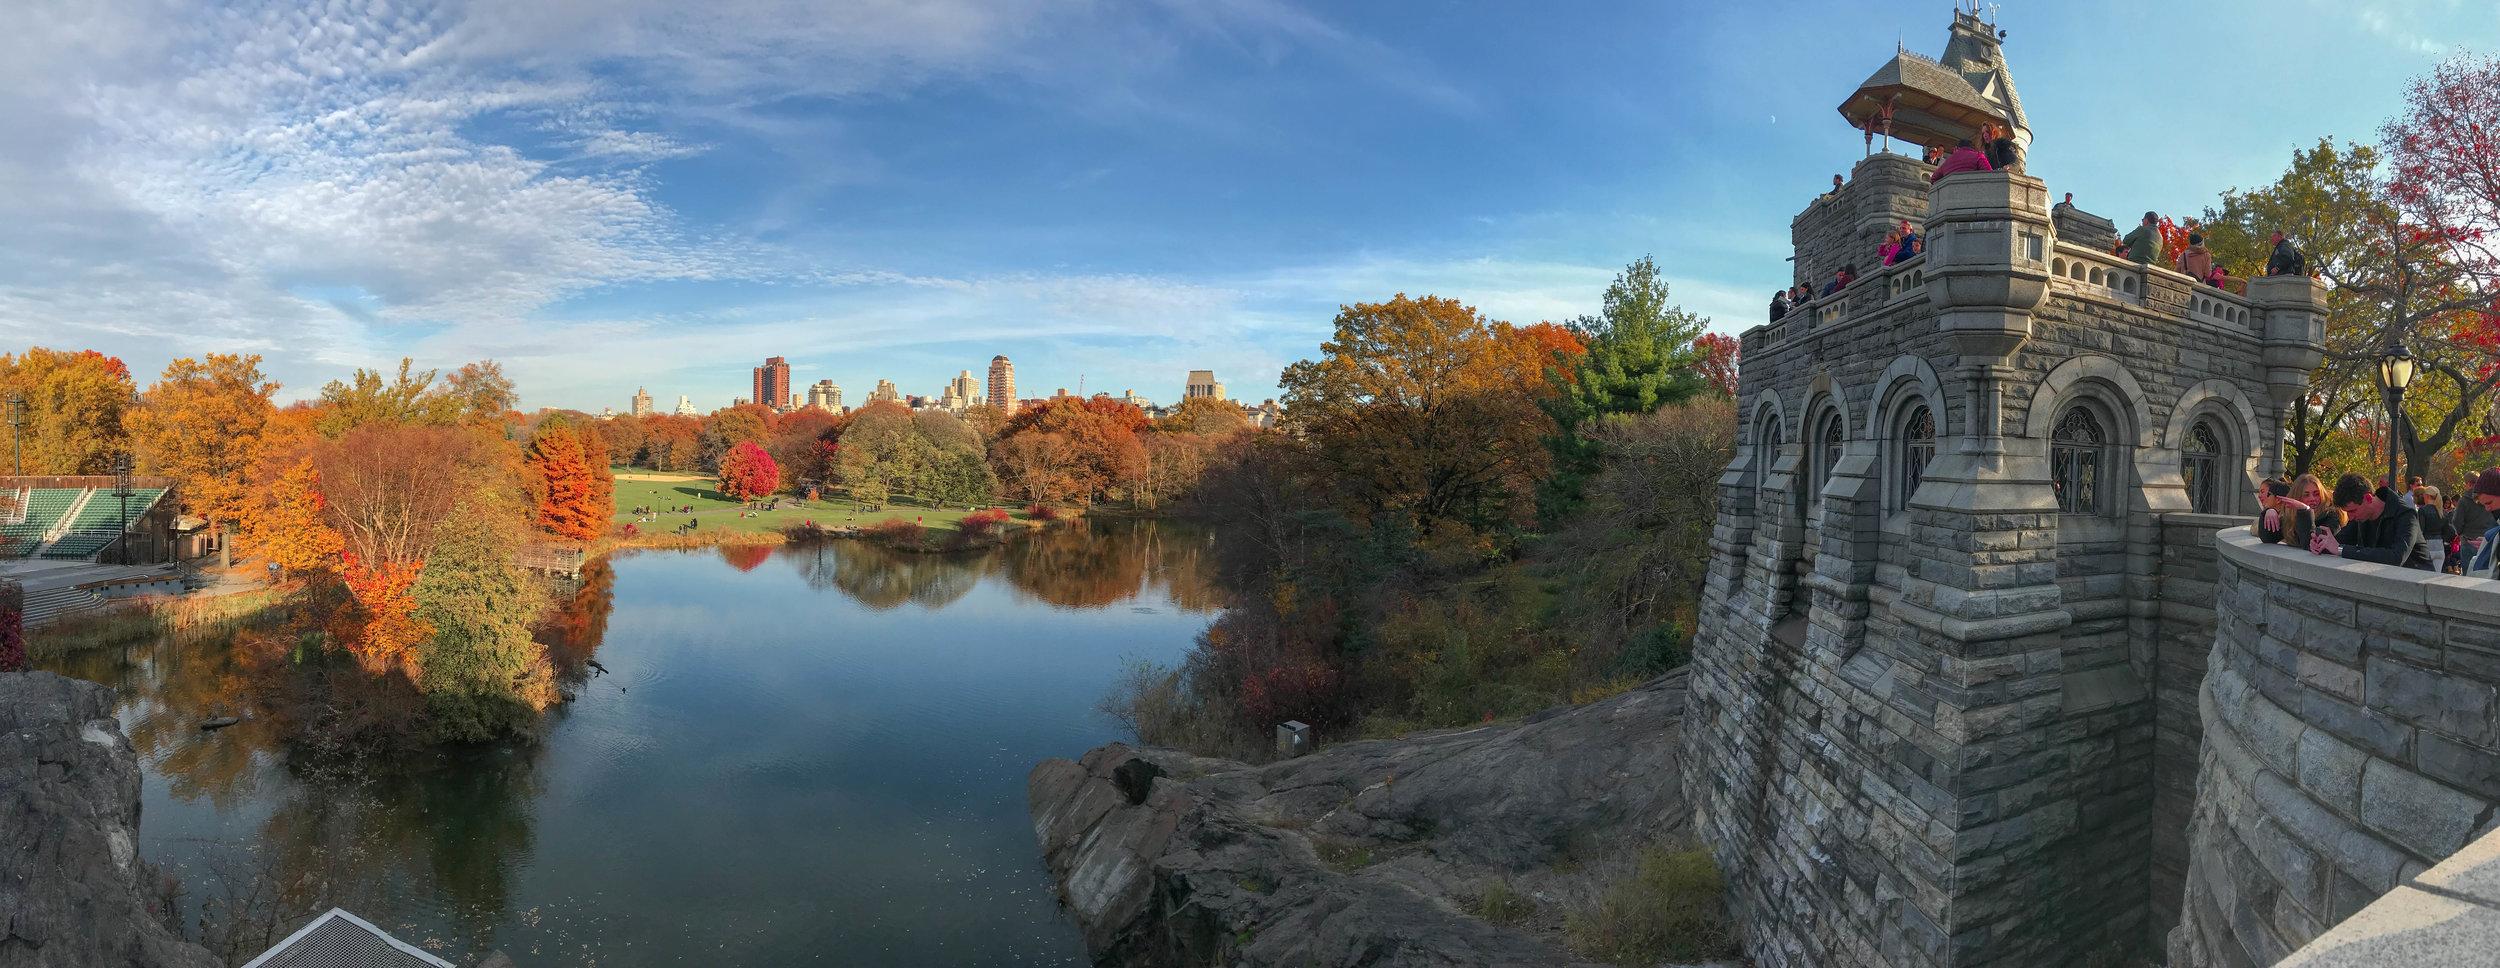 Belvedere Castle, Central Park, NYC